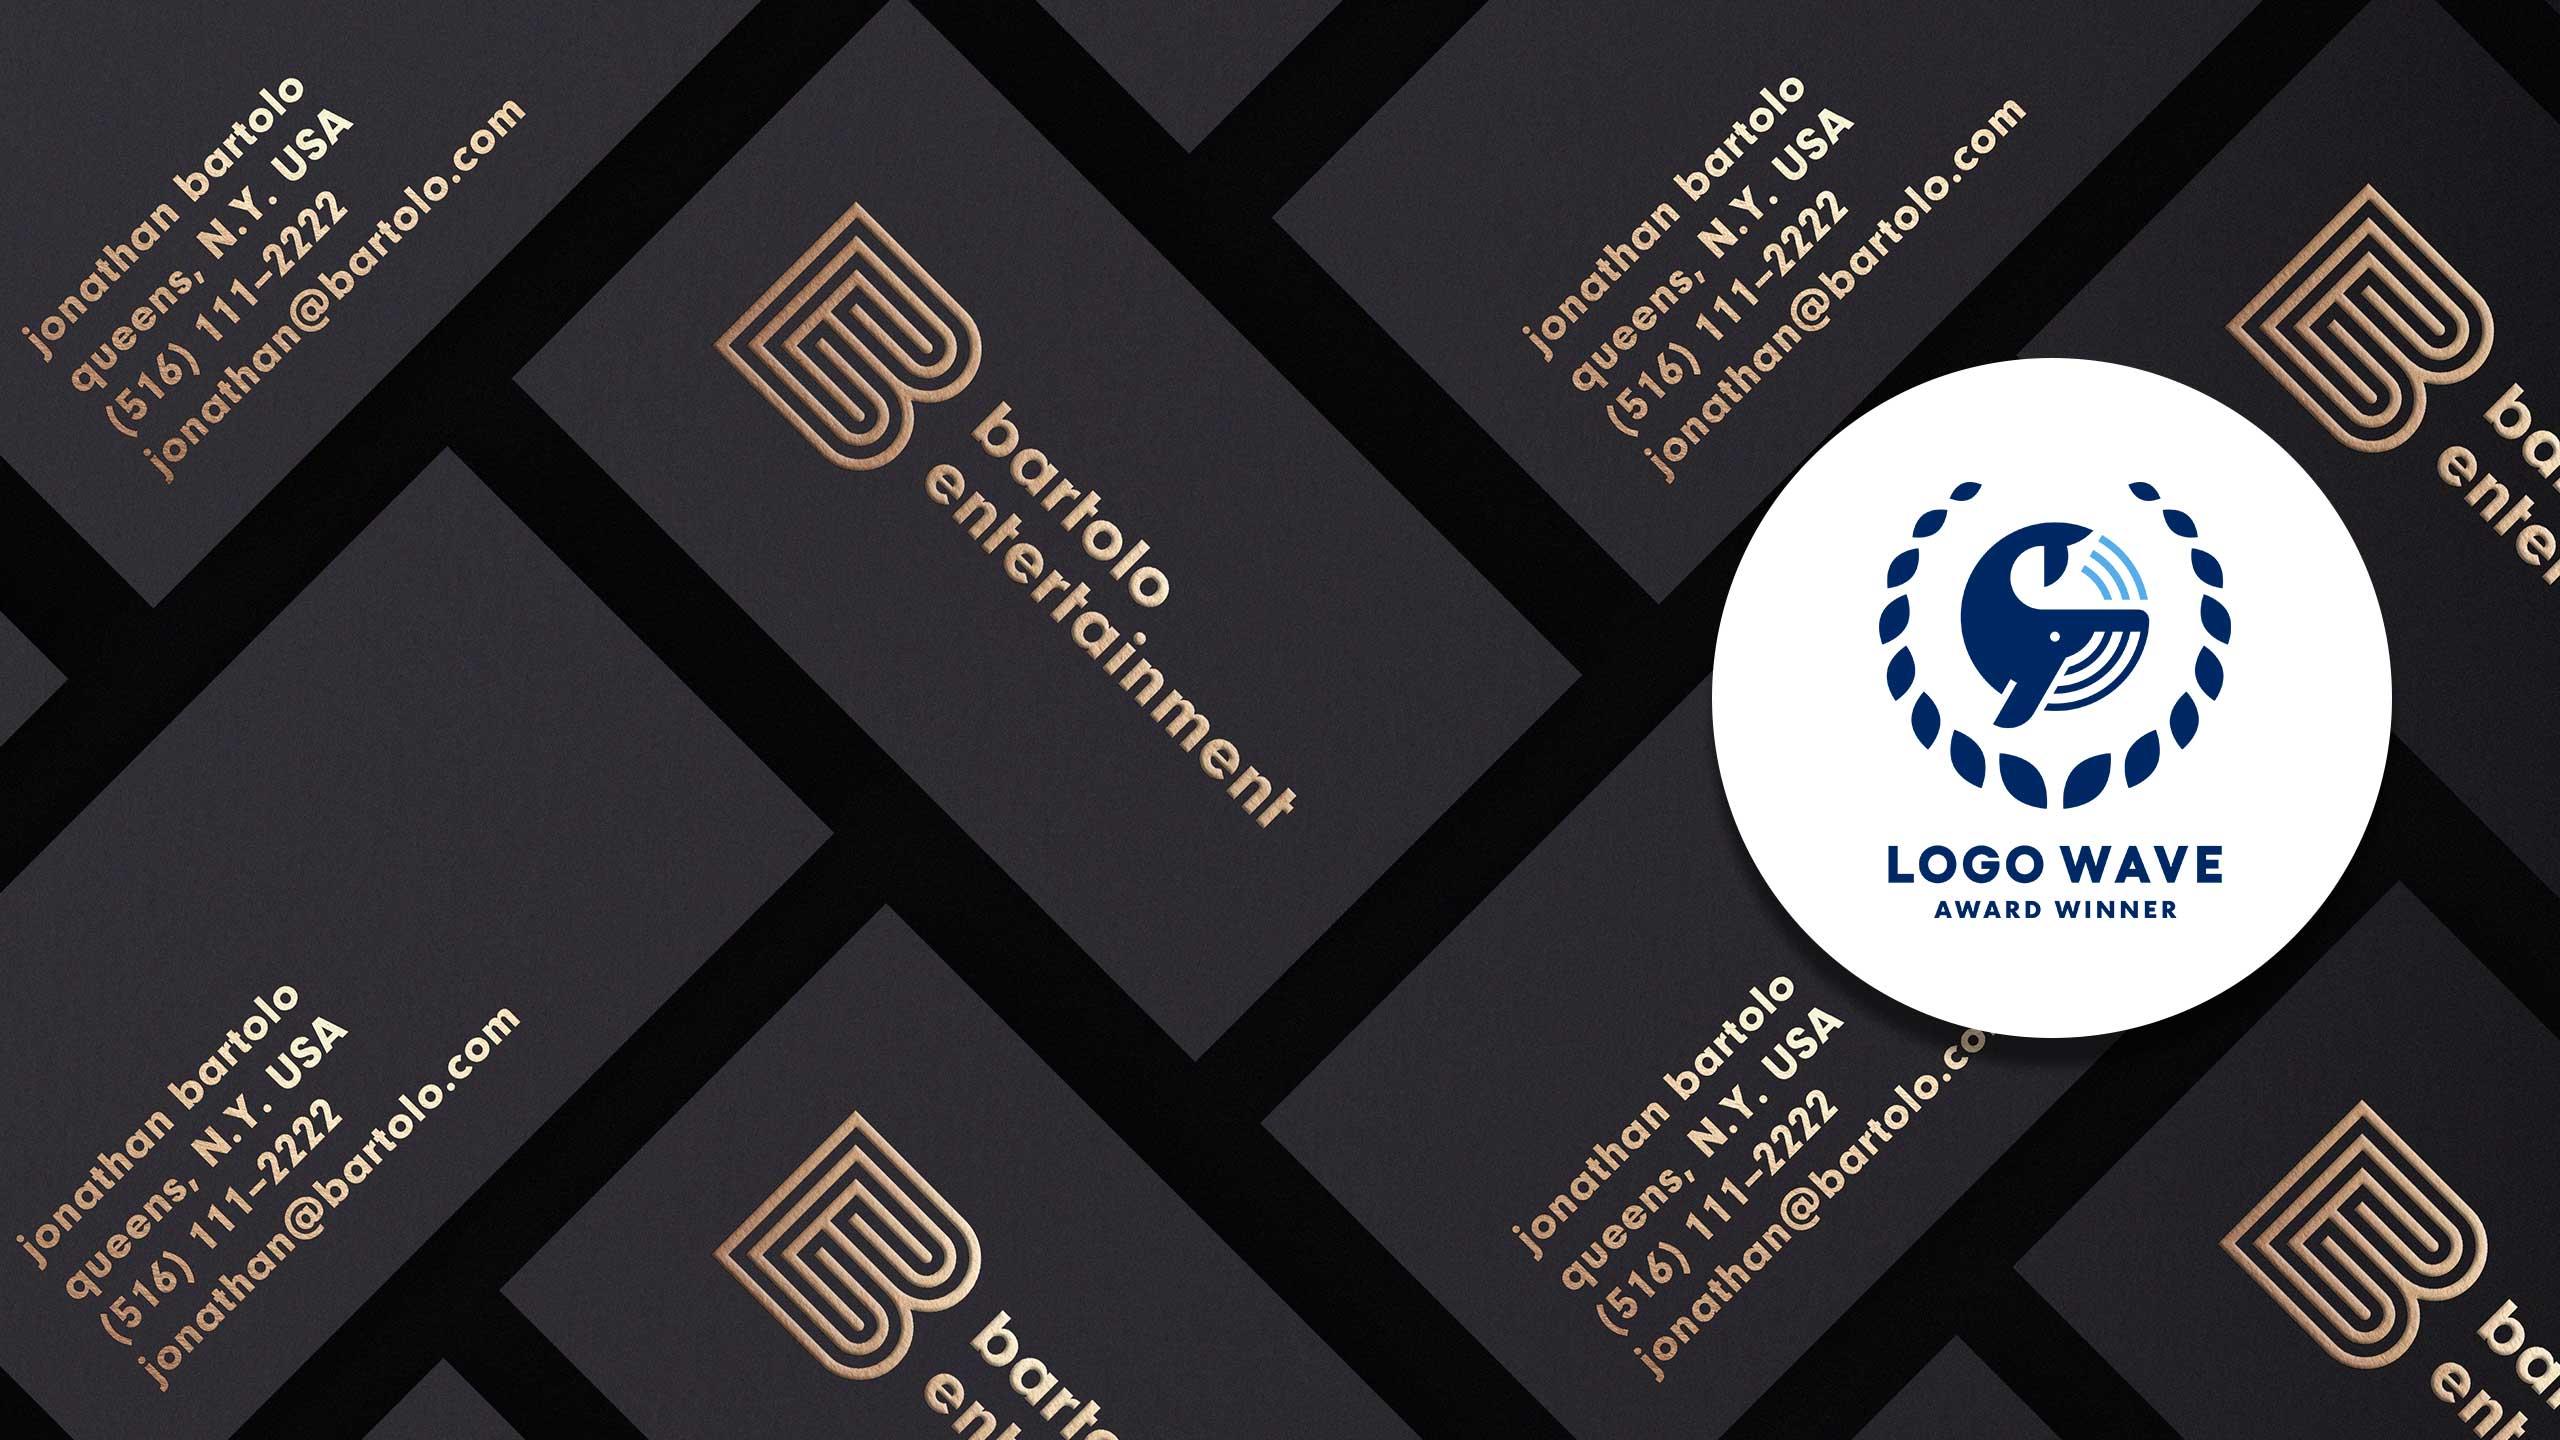 Logo on business cards (with award logo)